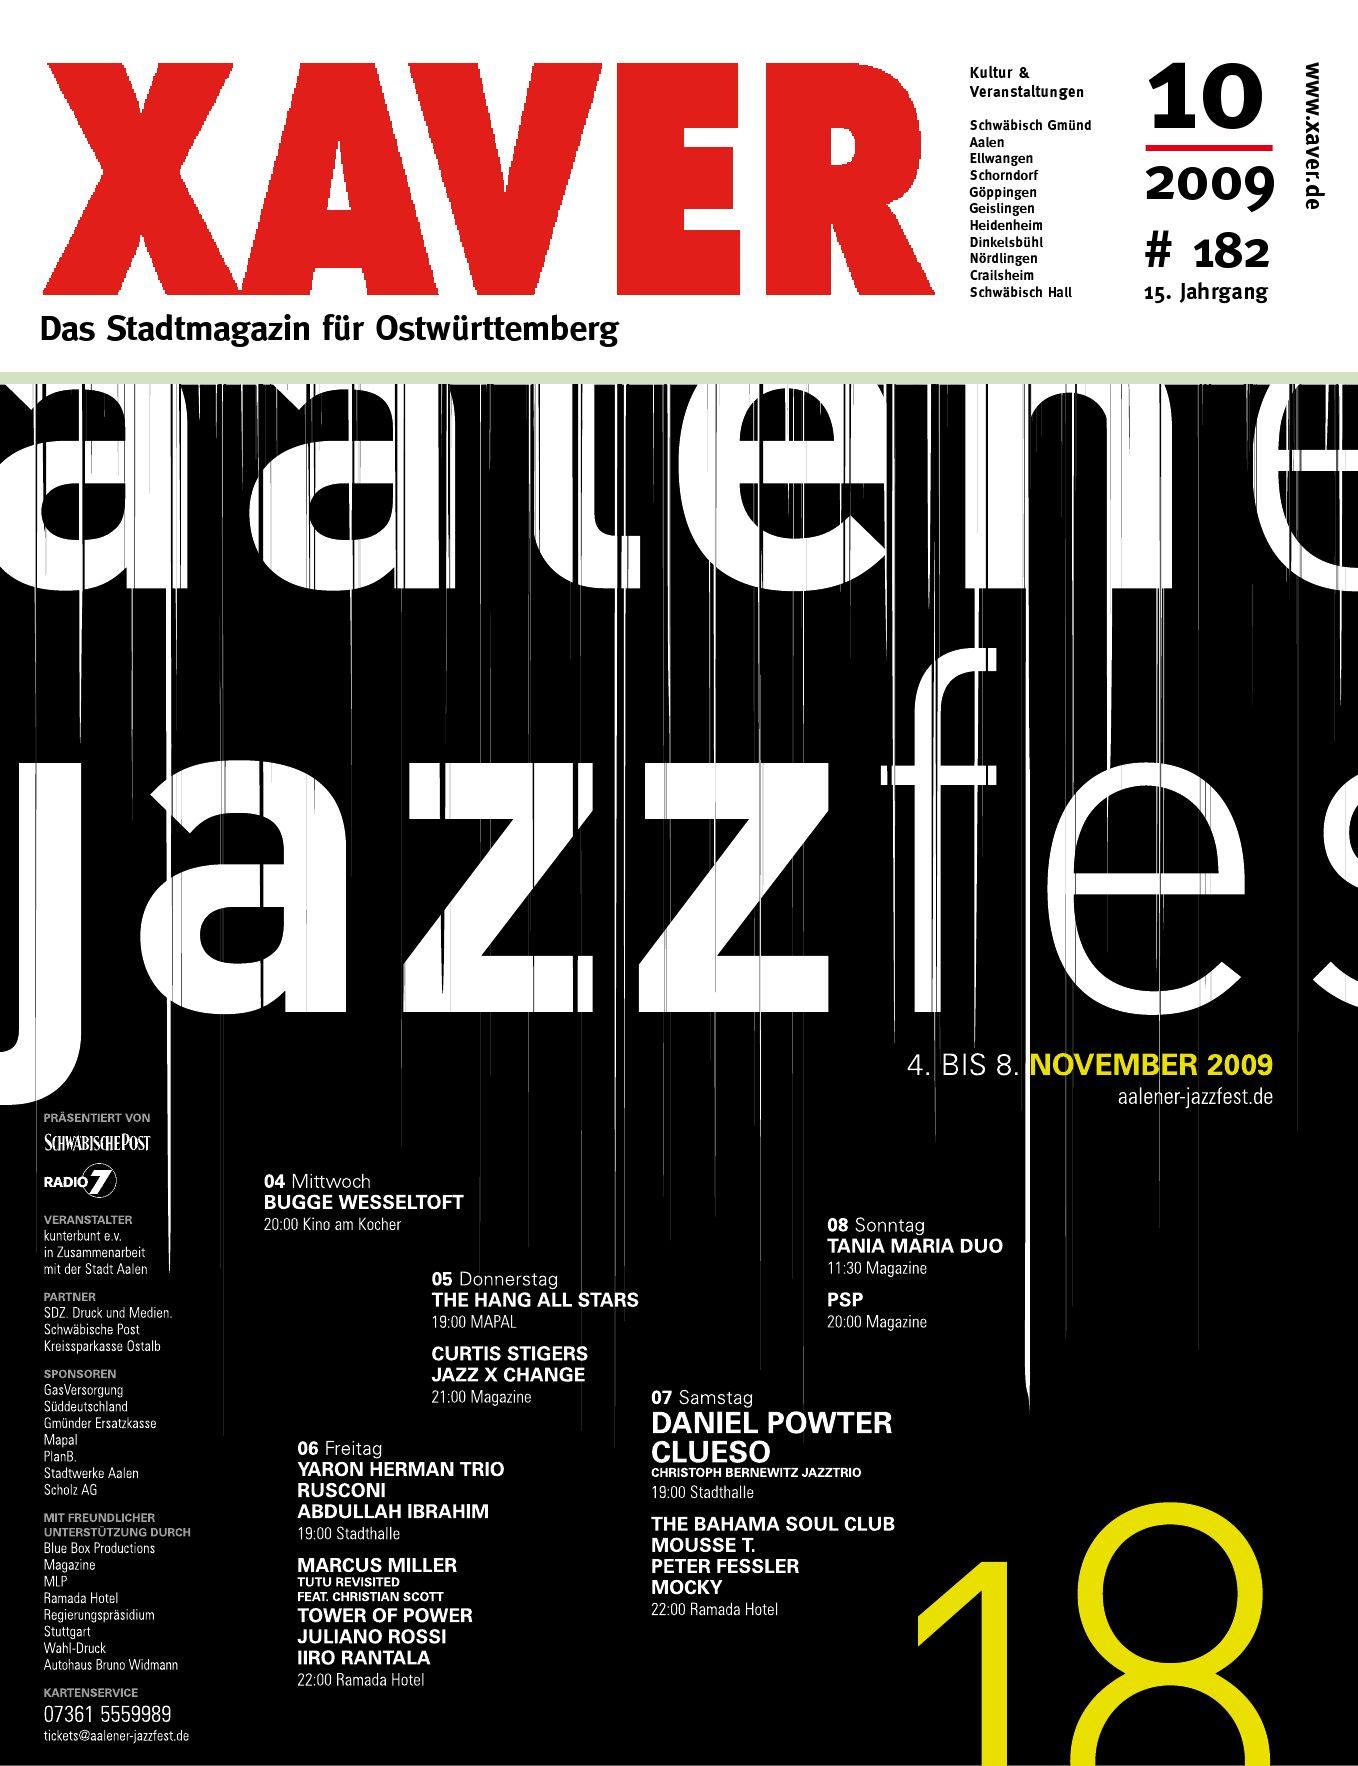 Xaver Oktober 09 By Hariolf Erhardt Issuu